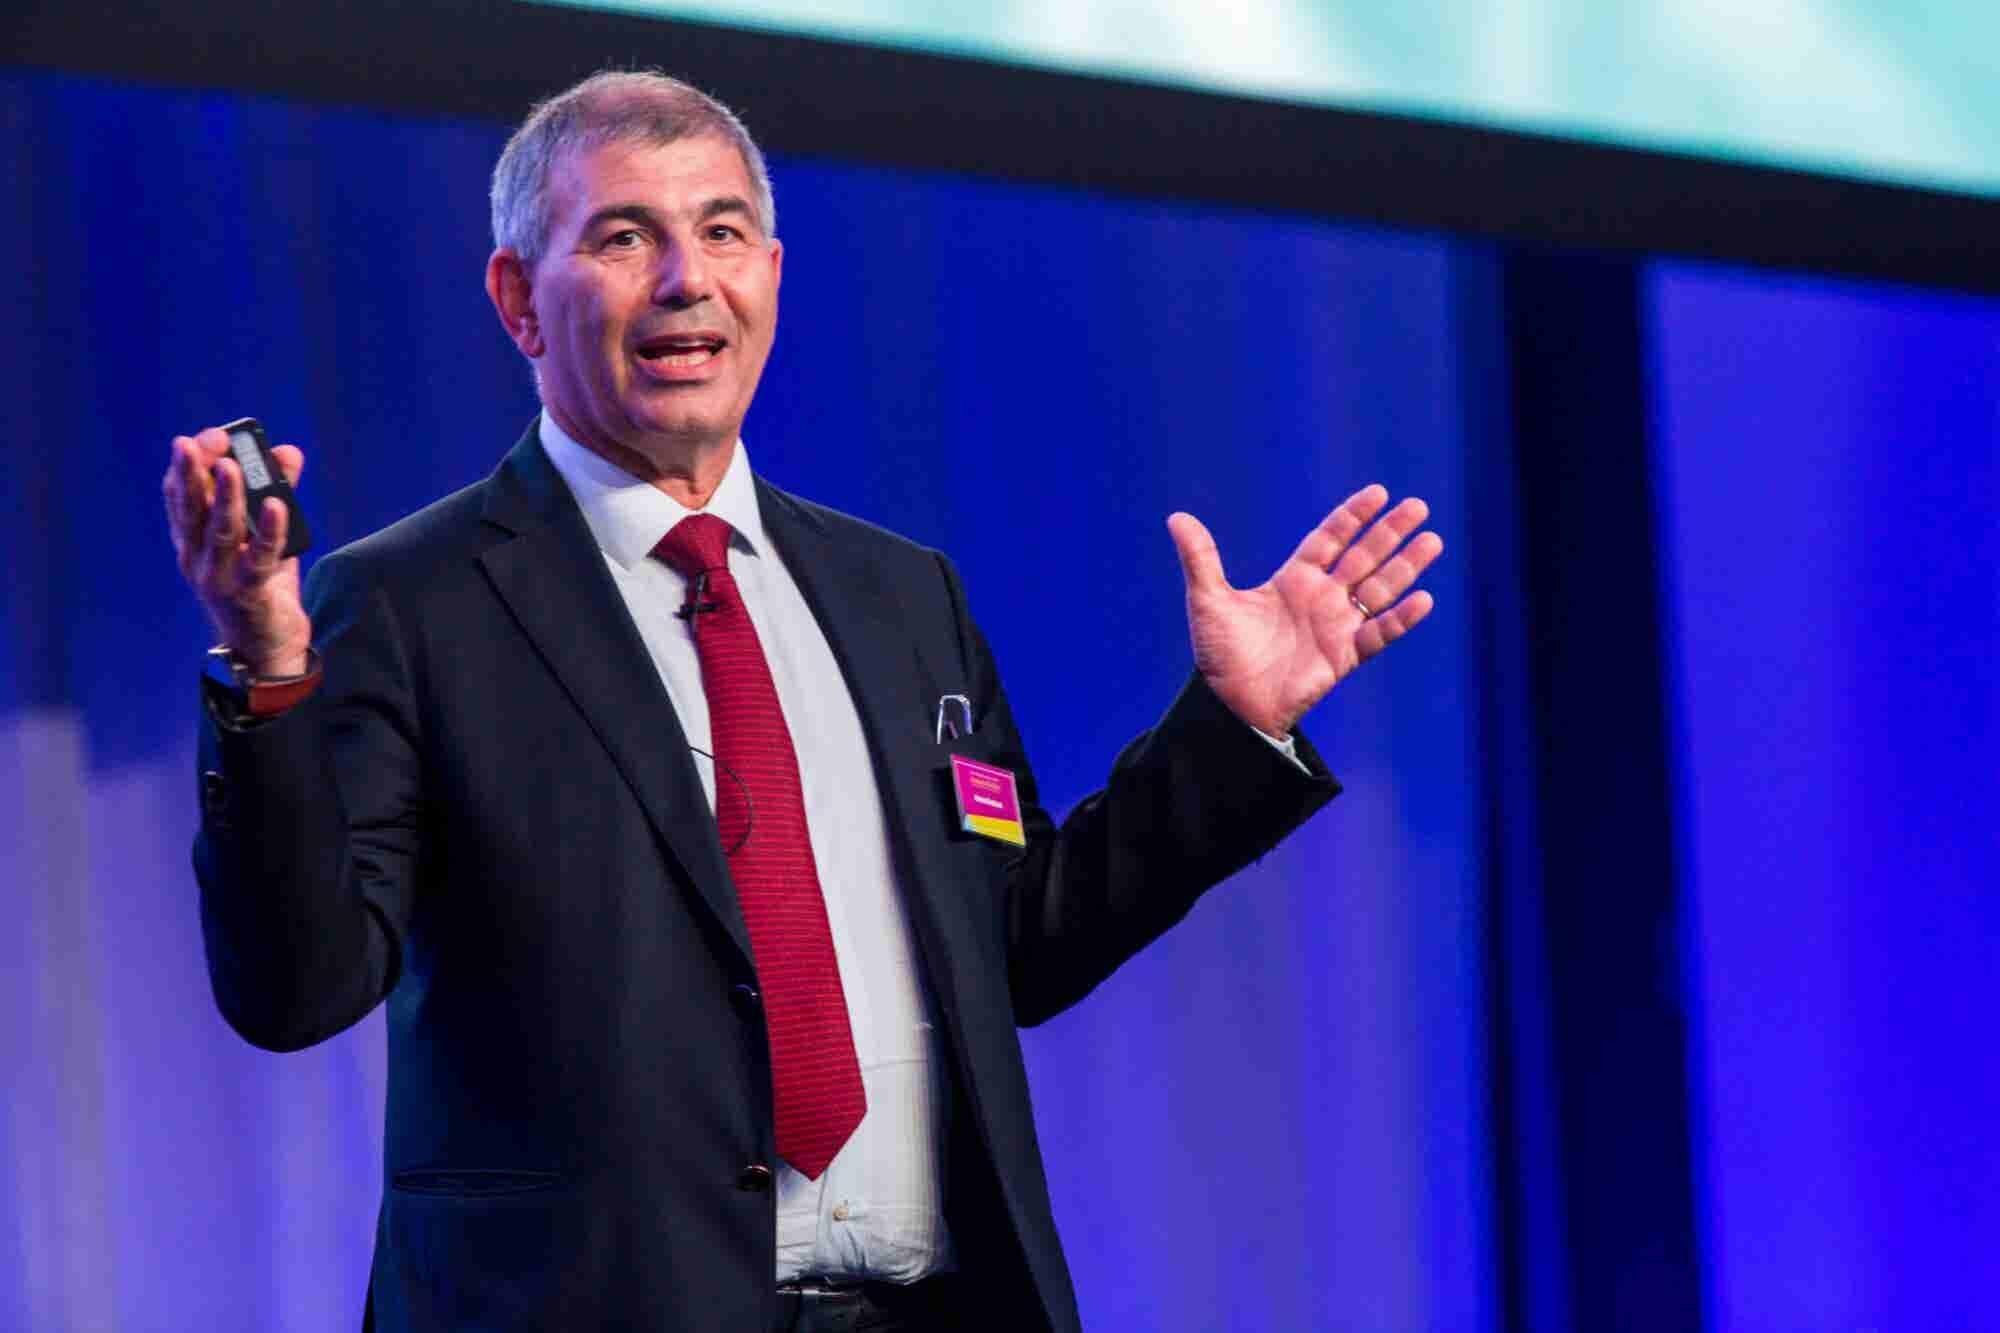 Follow The Leader: Patrick Chalhoub, Co-CEO, Chalhoub Group